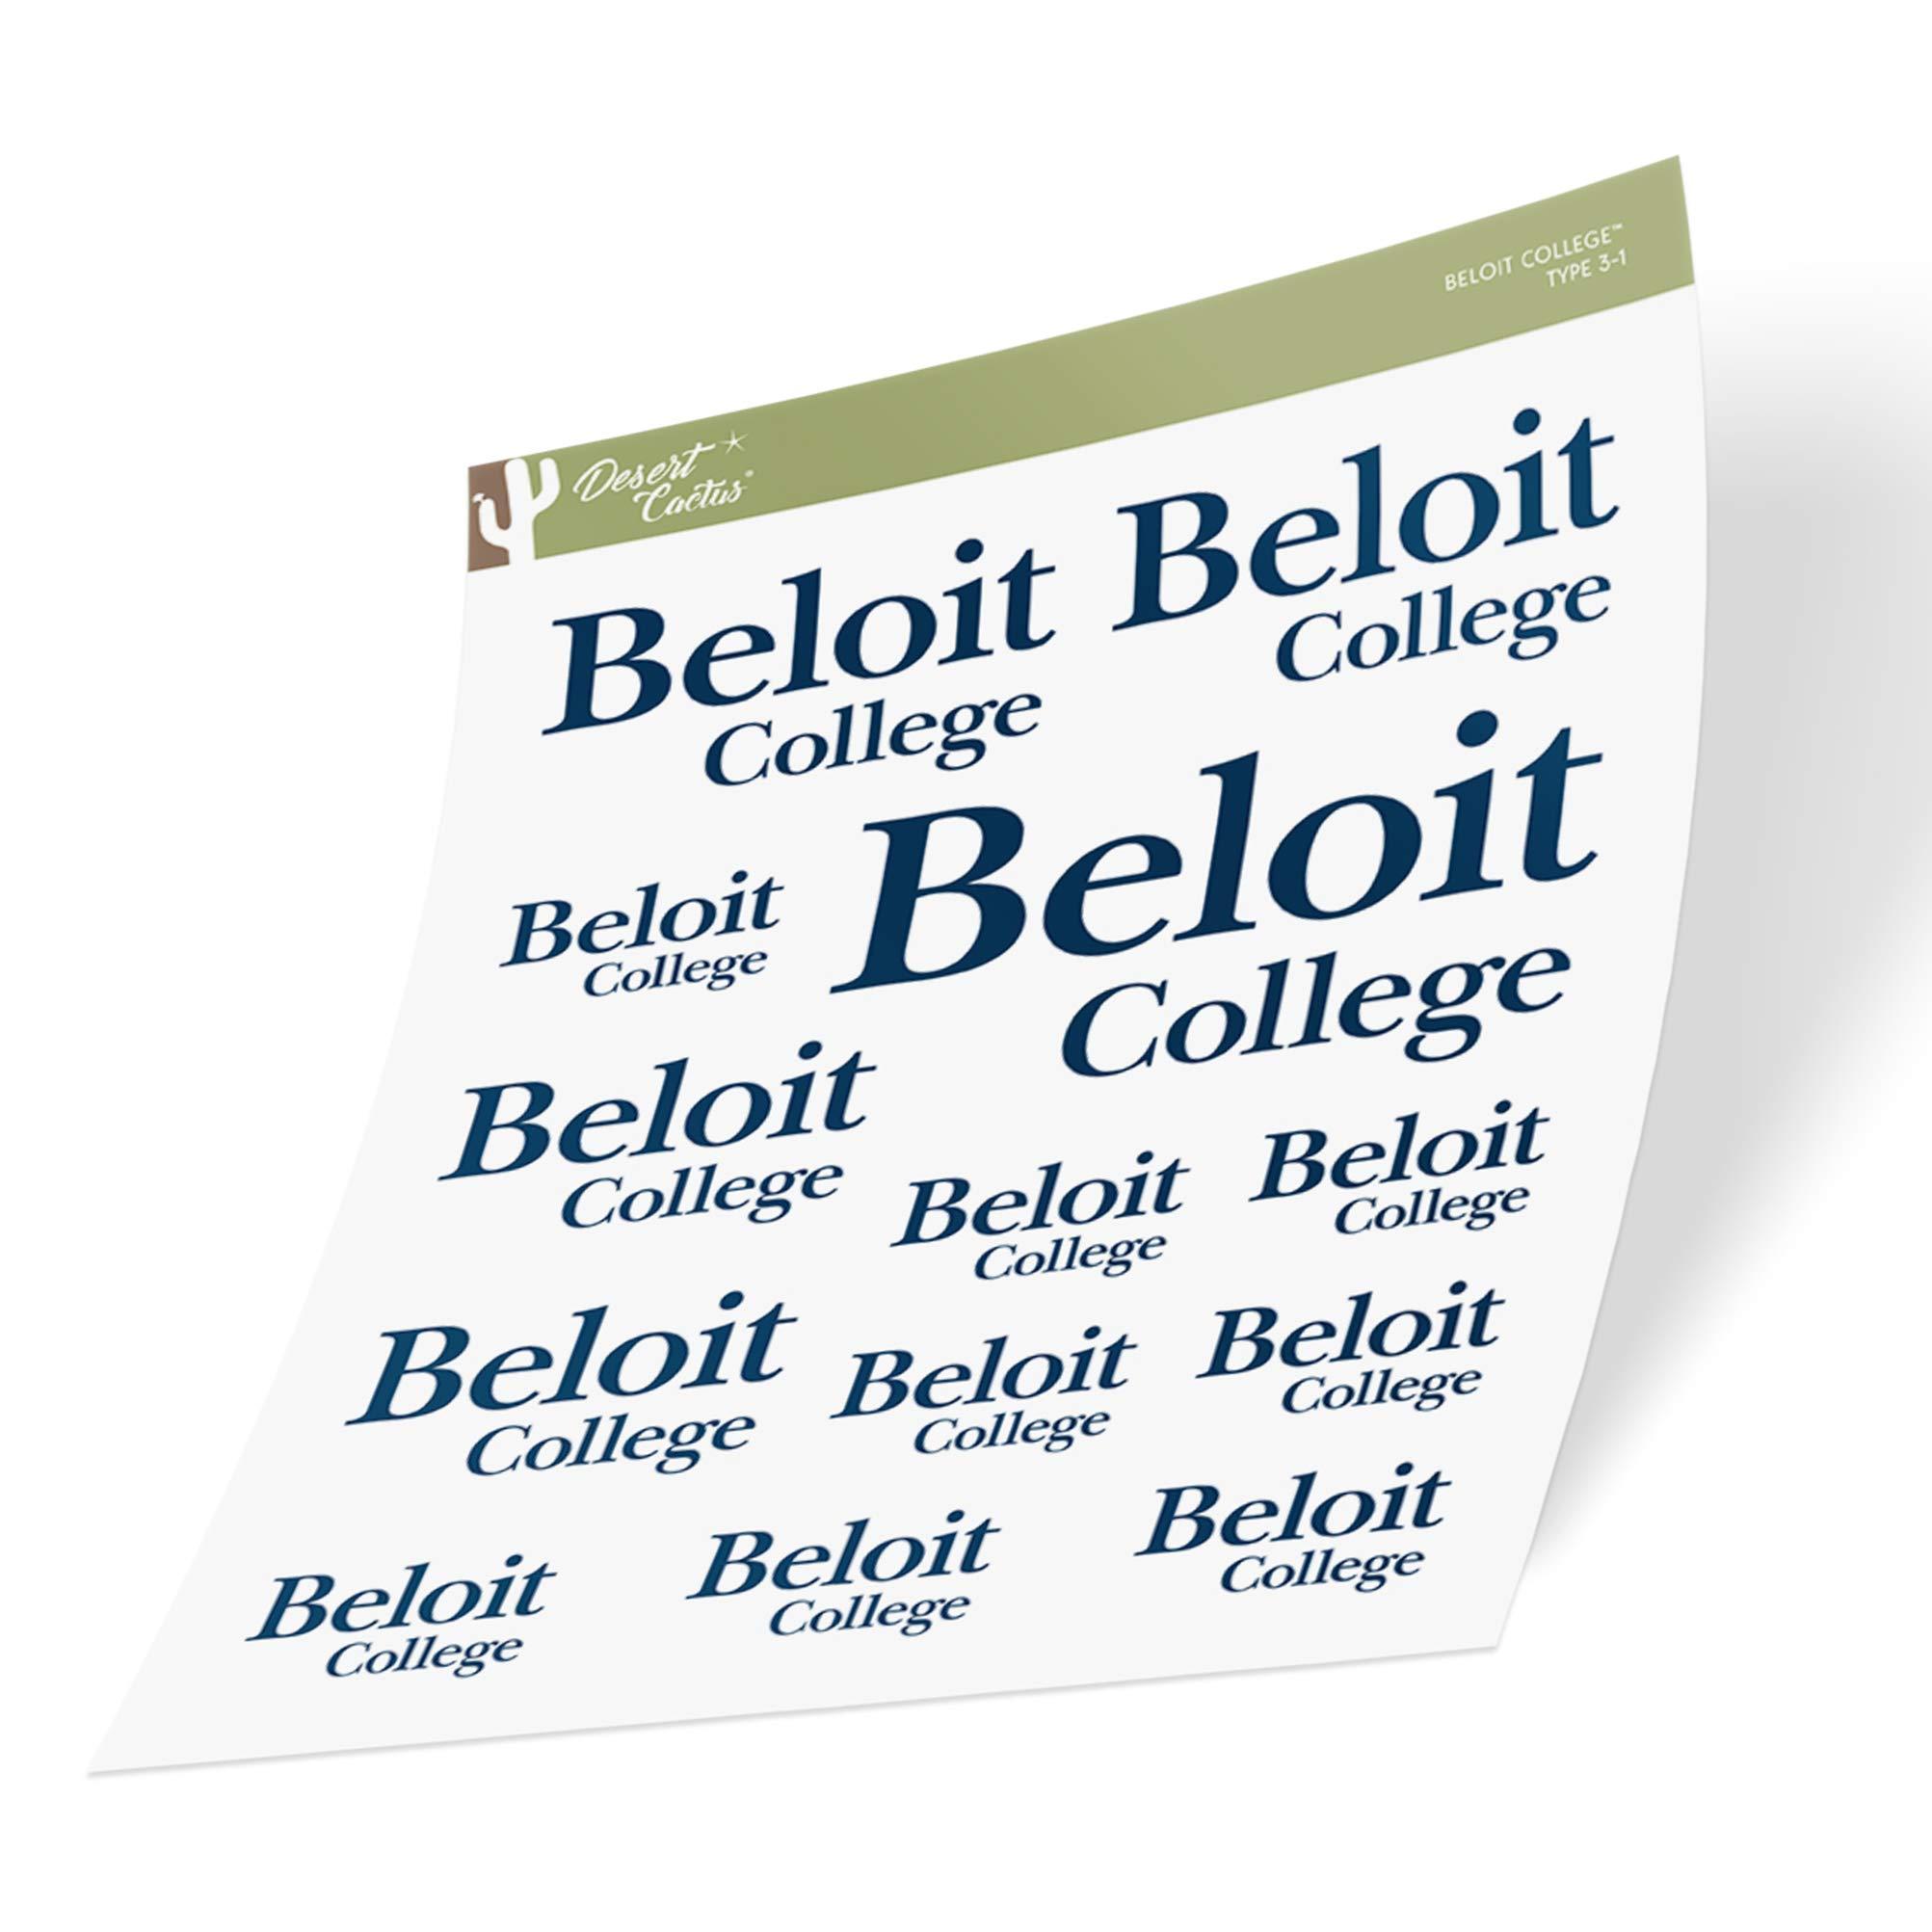 Desert Cactus Beloit College Bucs Buccaneers NCAA Metal License Plate Frame for Front or Back of Car Officially Licensed Alumni